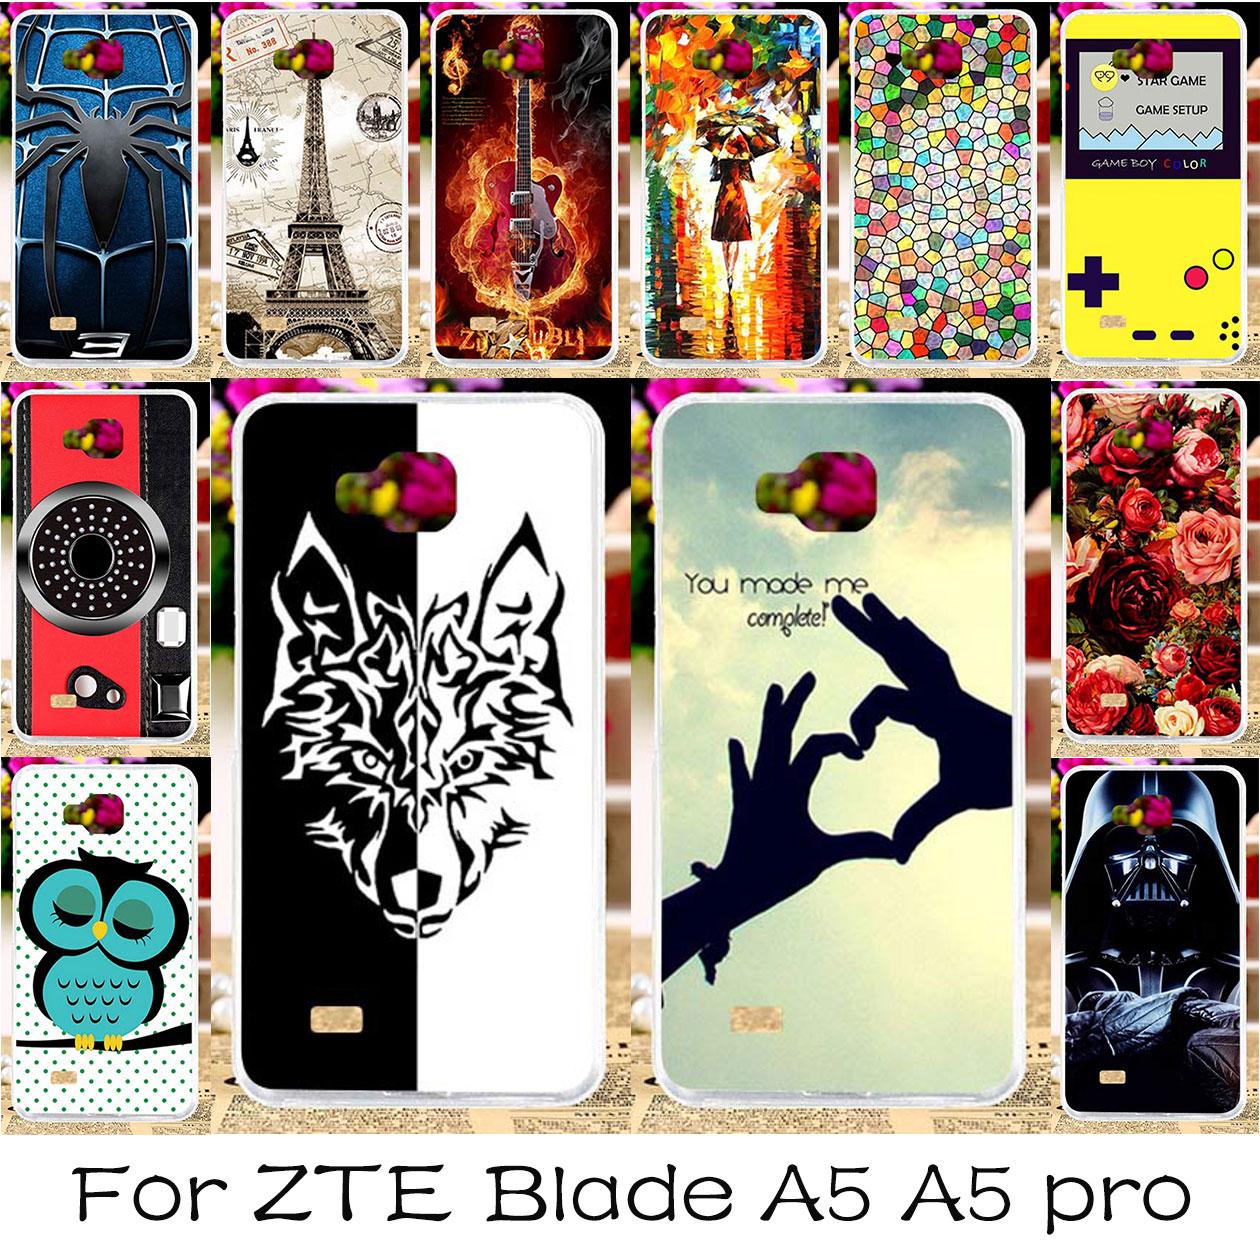 TAOYUNXI DIY Silicone Phone Case Cover For ZTE Blade AF3 A3 ZTE Blade A5 A5 pro AF 3 C341 T221 ZTE OPEN C2 Housing Bag Skin Case